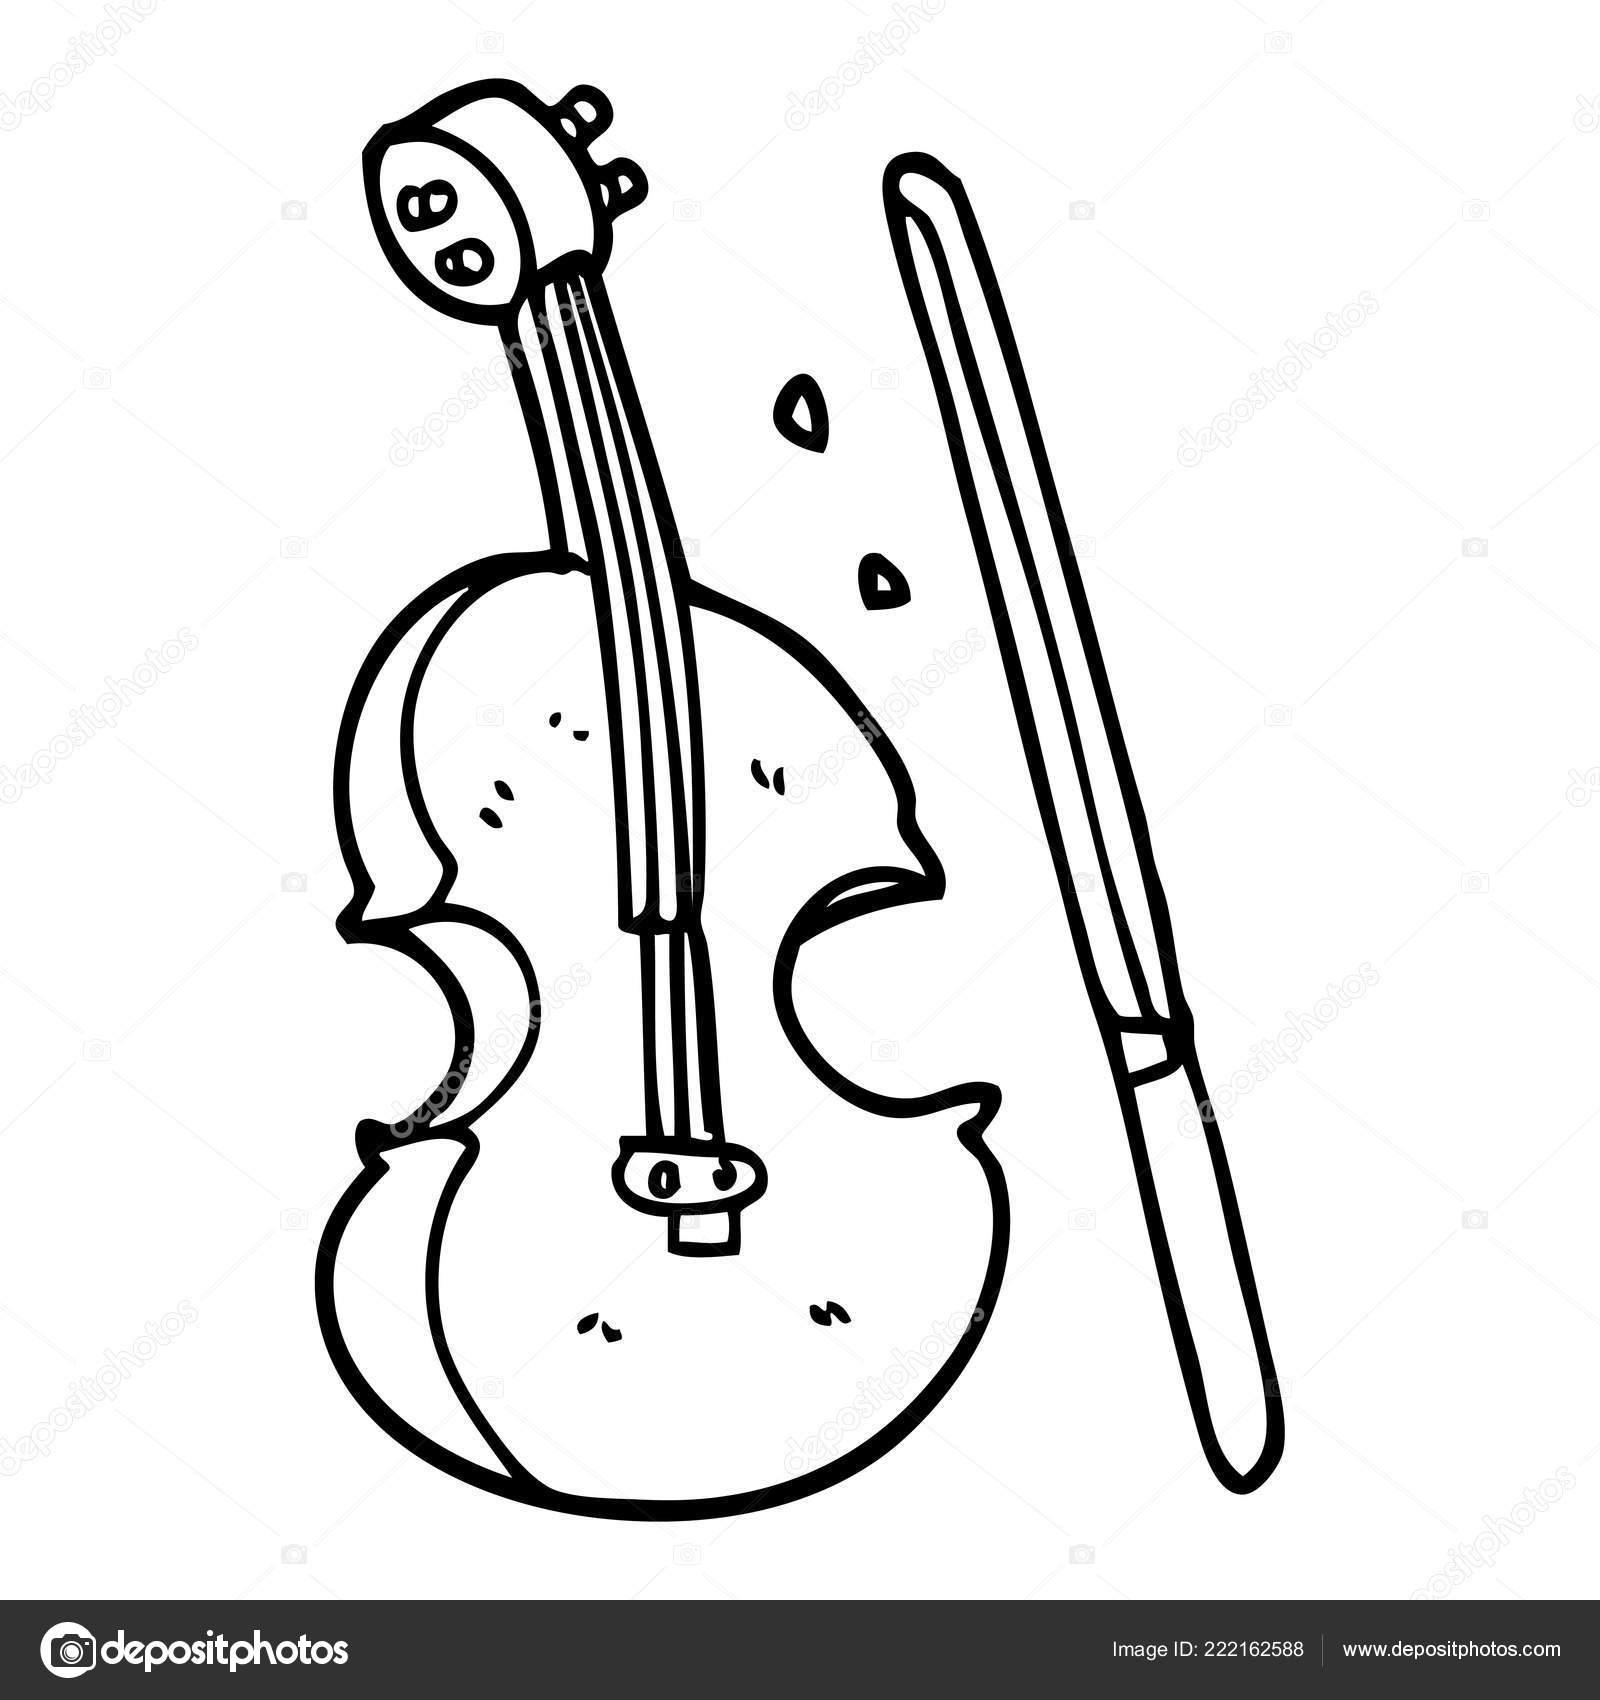 Line Drawing Cartoon Violin Bow Stock Vector C Lineartestpilot